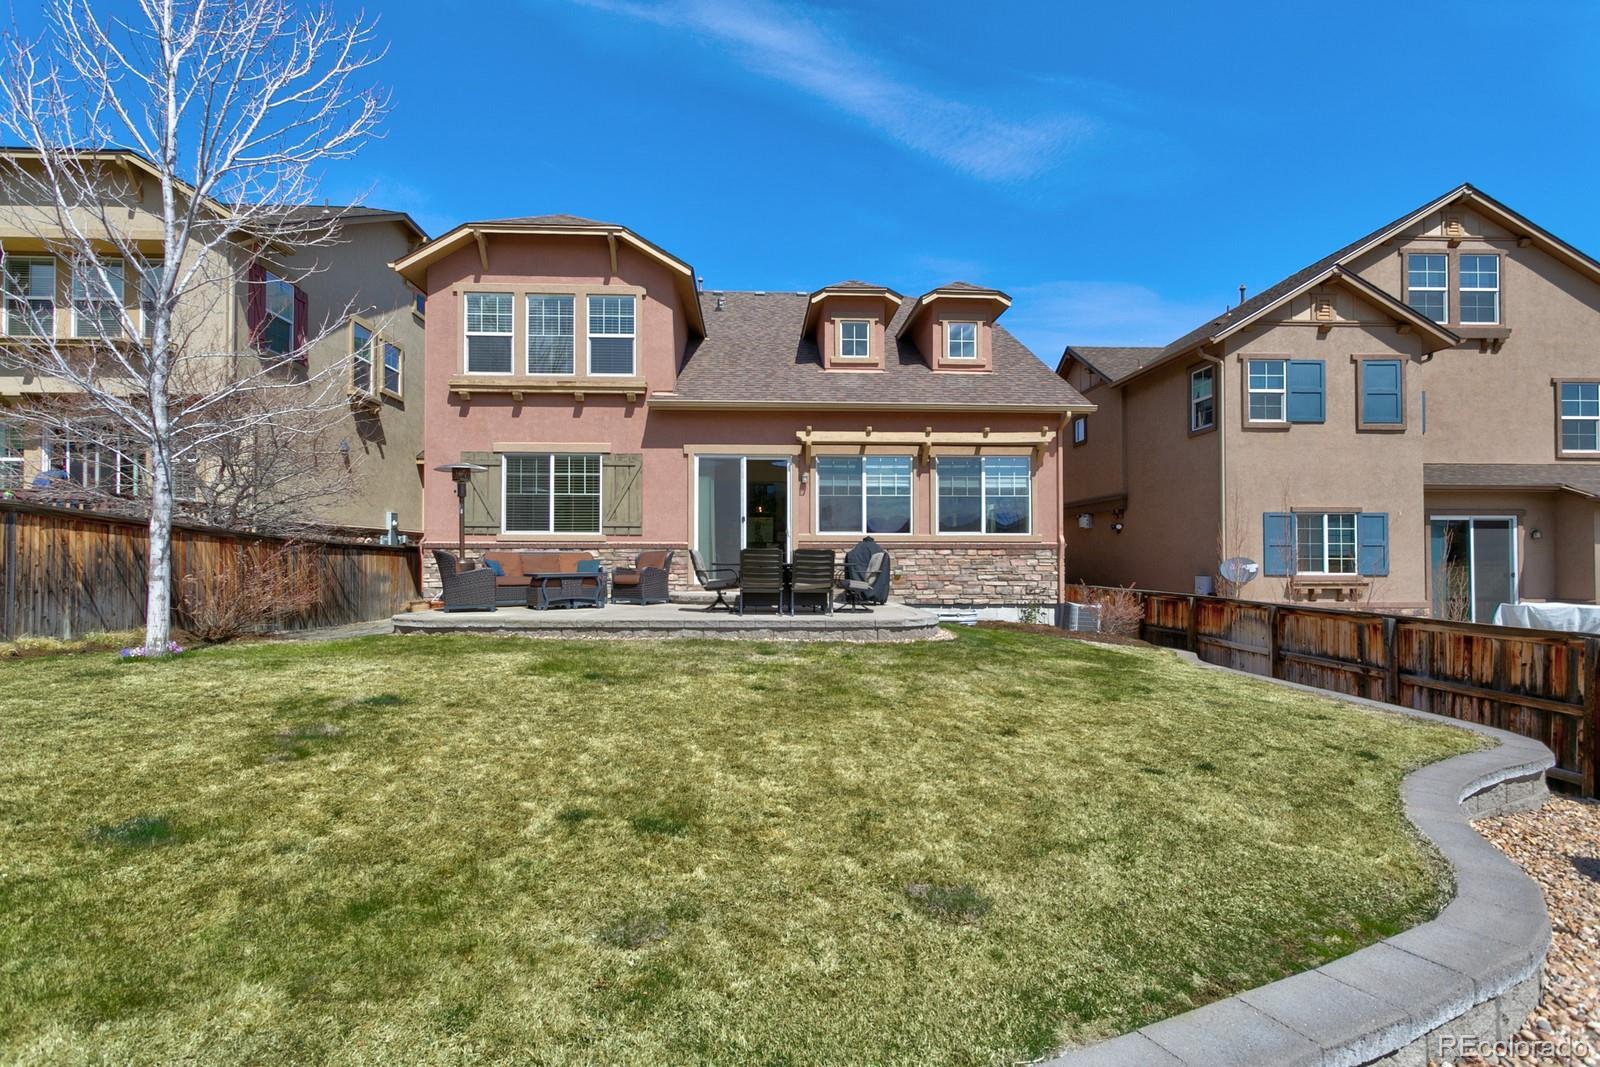 MLS# 6747511 - 26 - 4568 Valleybrook Drive, Highlands Ranch, CO 80130